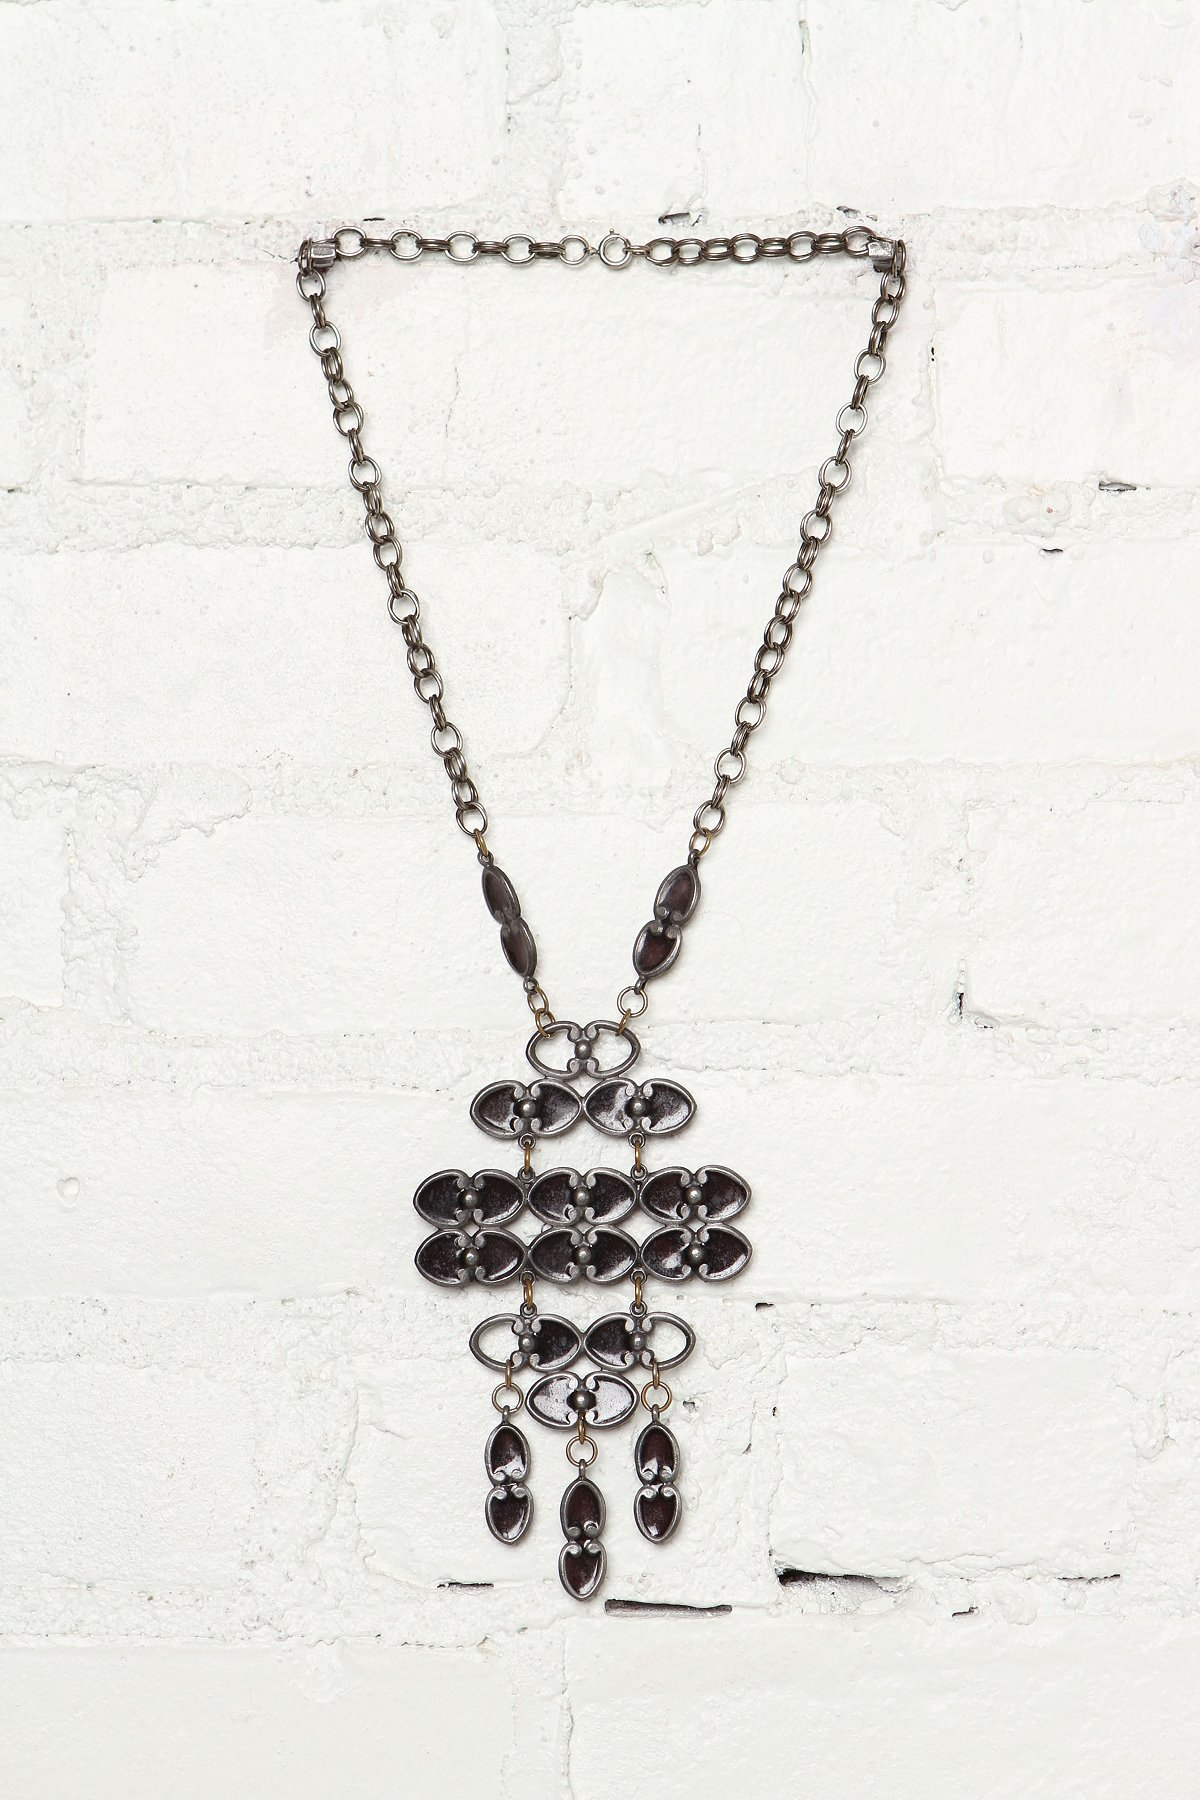 Vintage 1970s Necklace